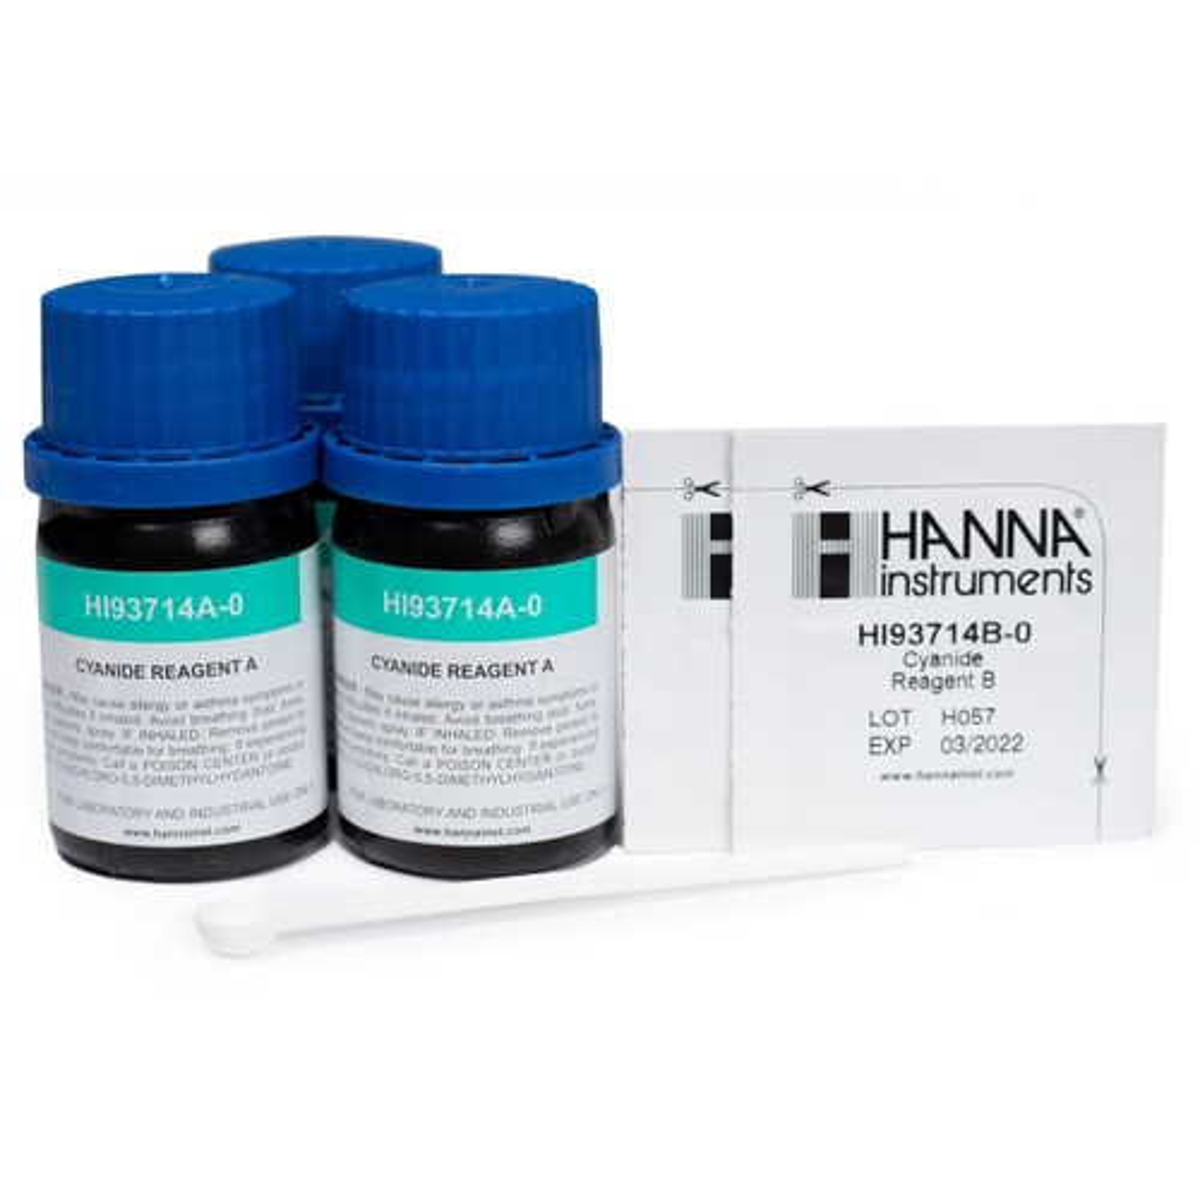 HI93714-01 Cyanide Reagents (100 tests)